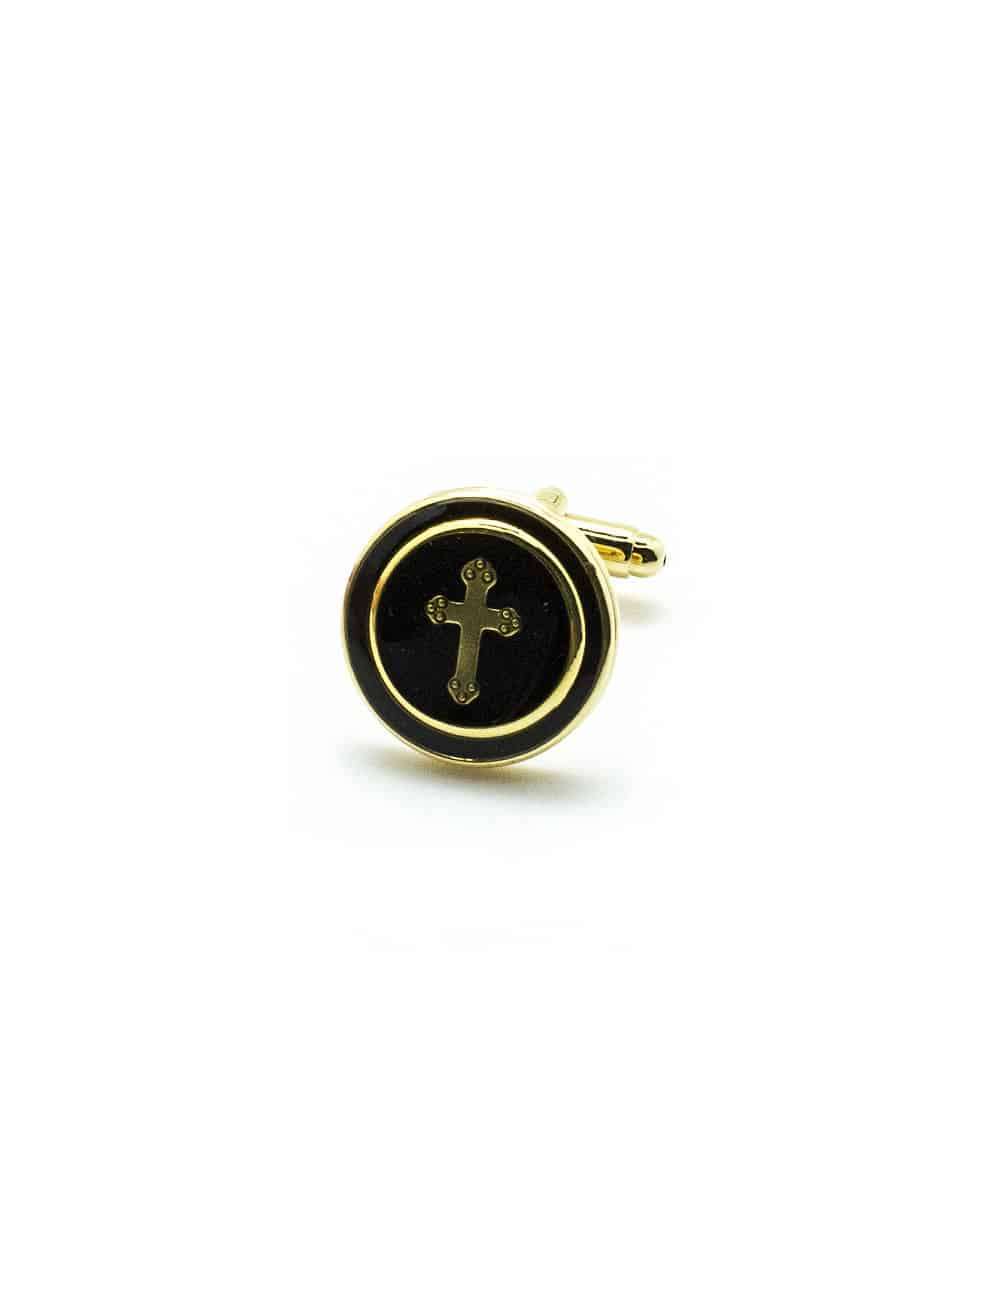 Black Enamel with Gold Cross in Gold Round Cufflink C231NF-041